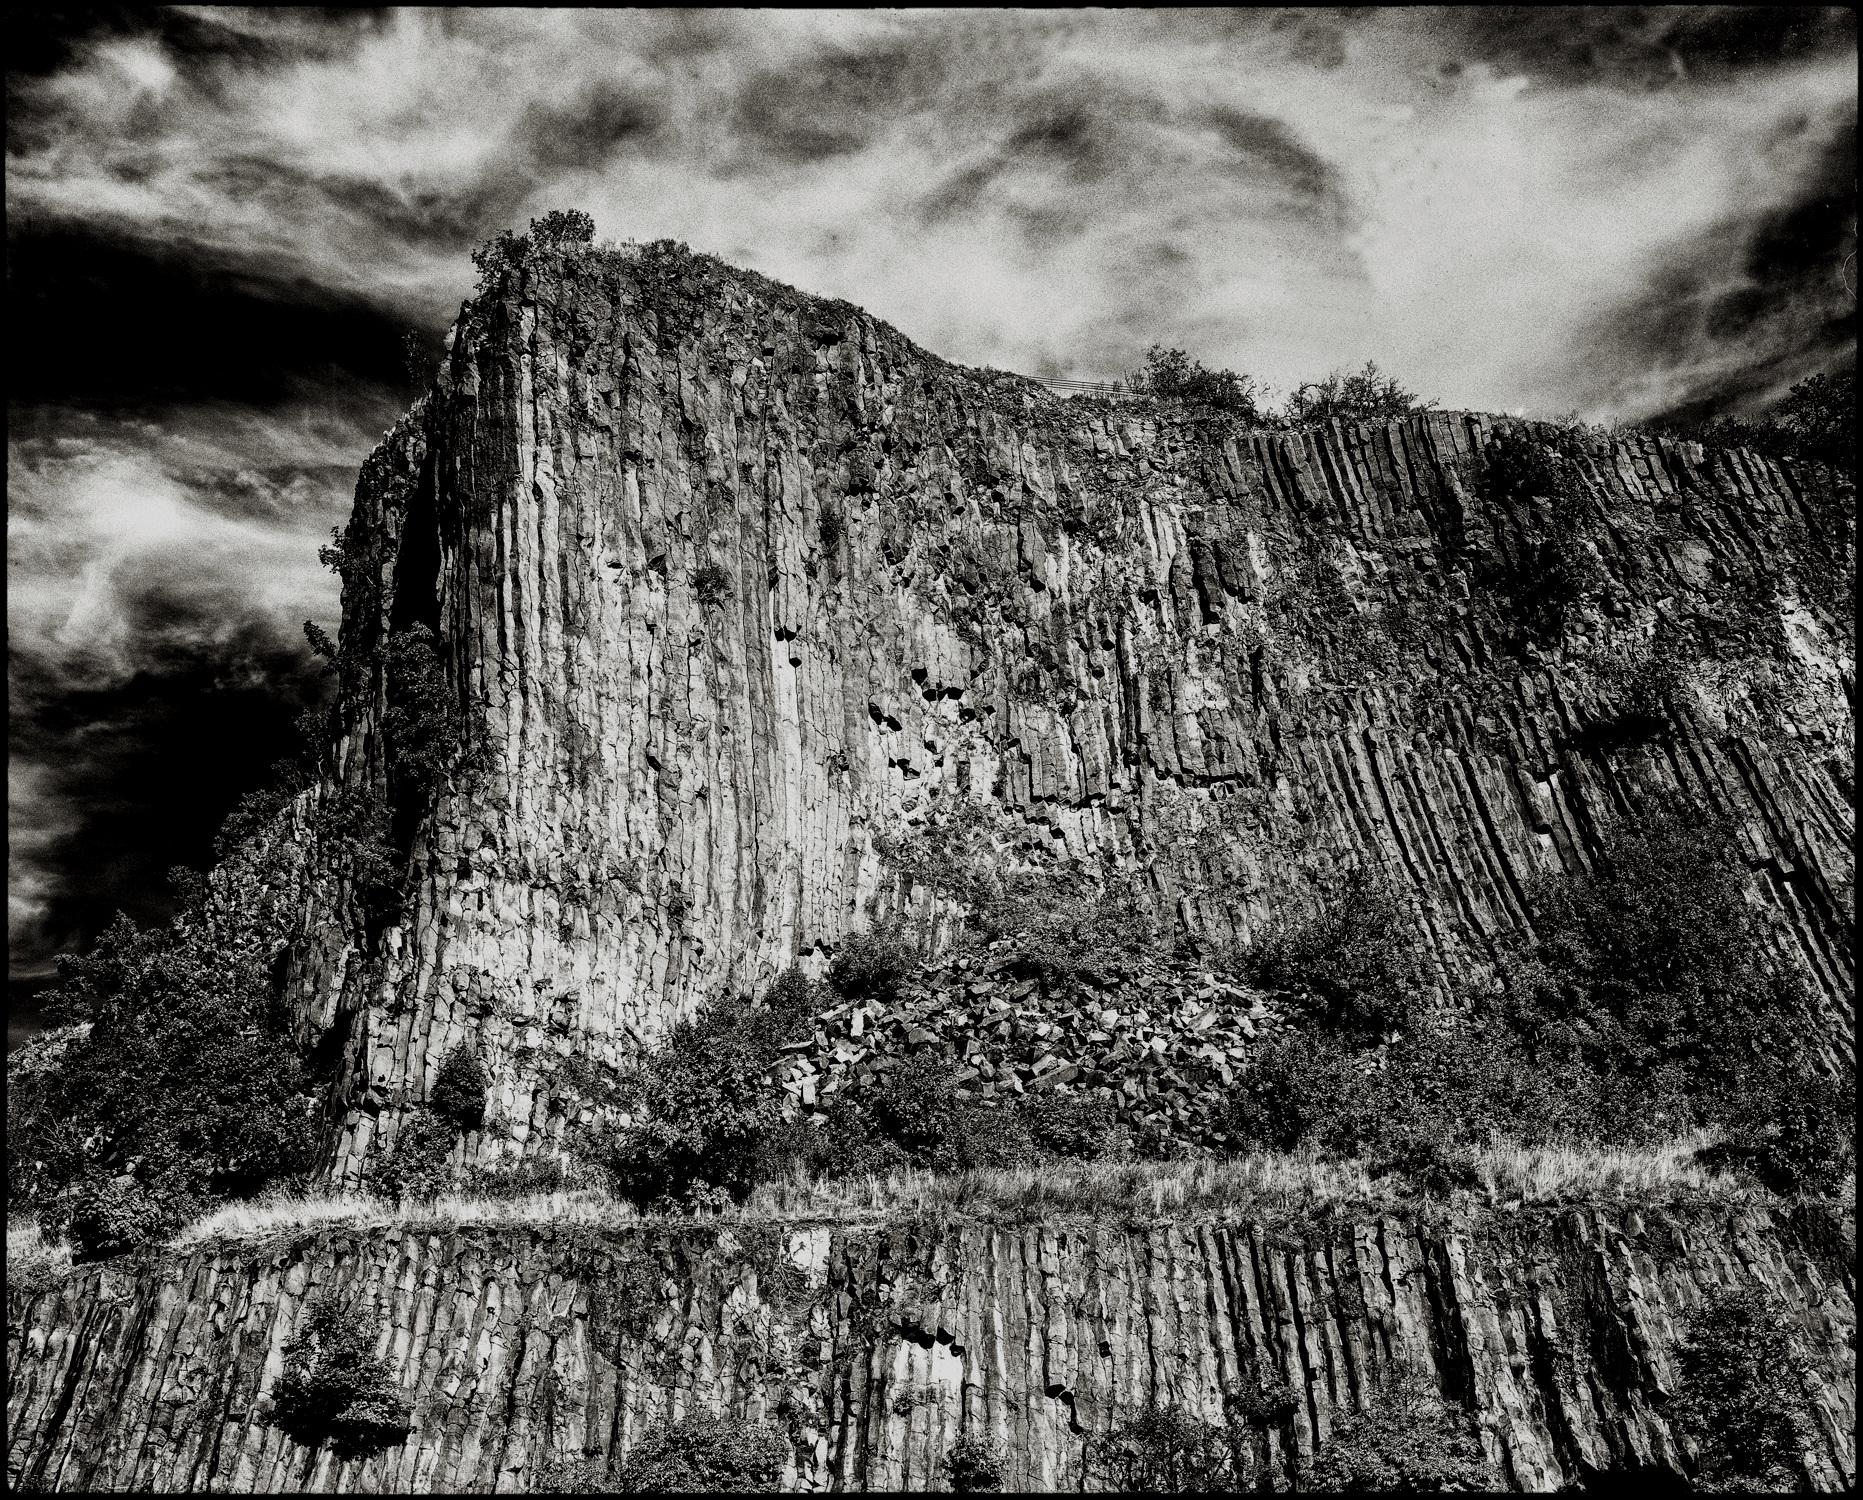 Volcanic basalt rock of Hegyestű (Pointed Needle), Balaton National Park, Lake Balaton, Hungary.